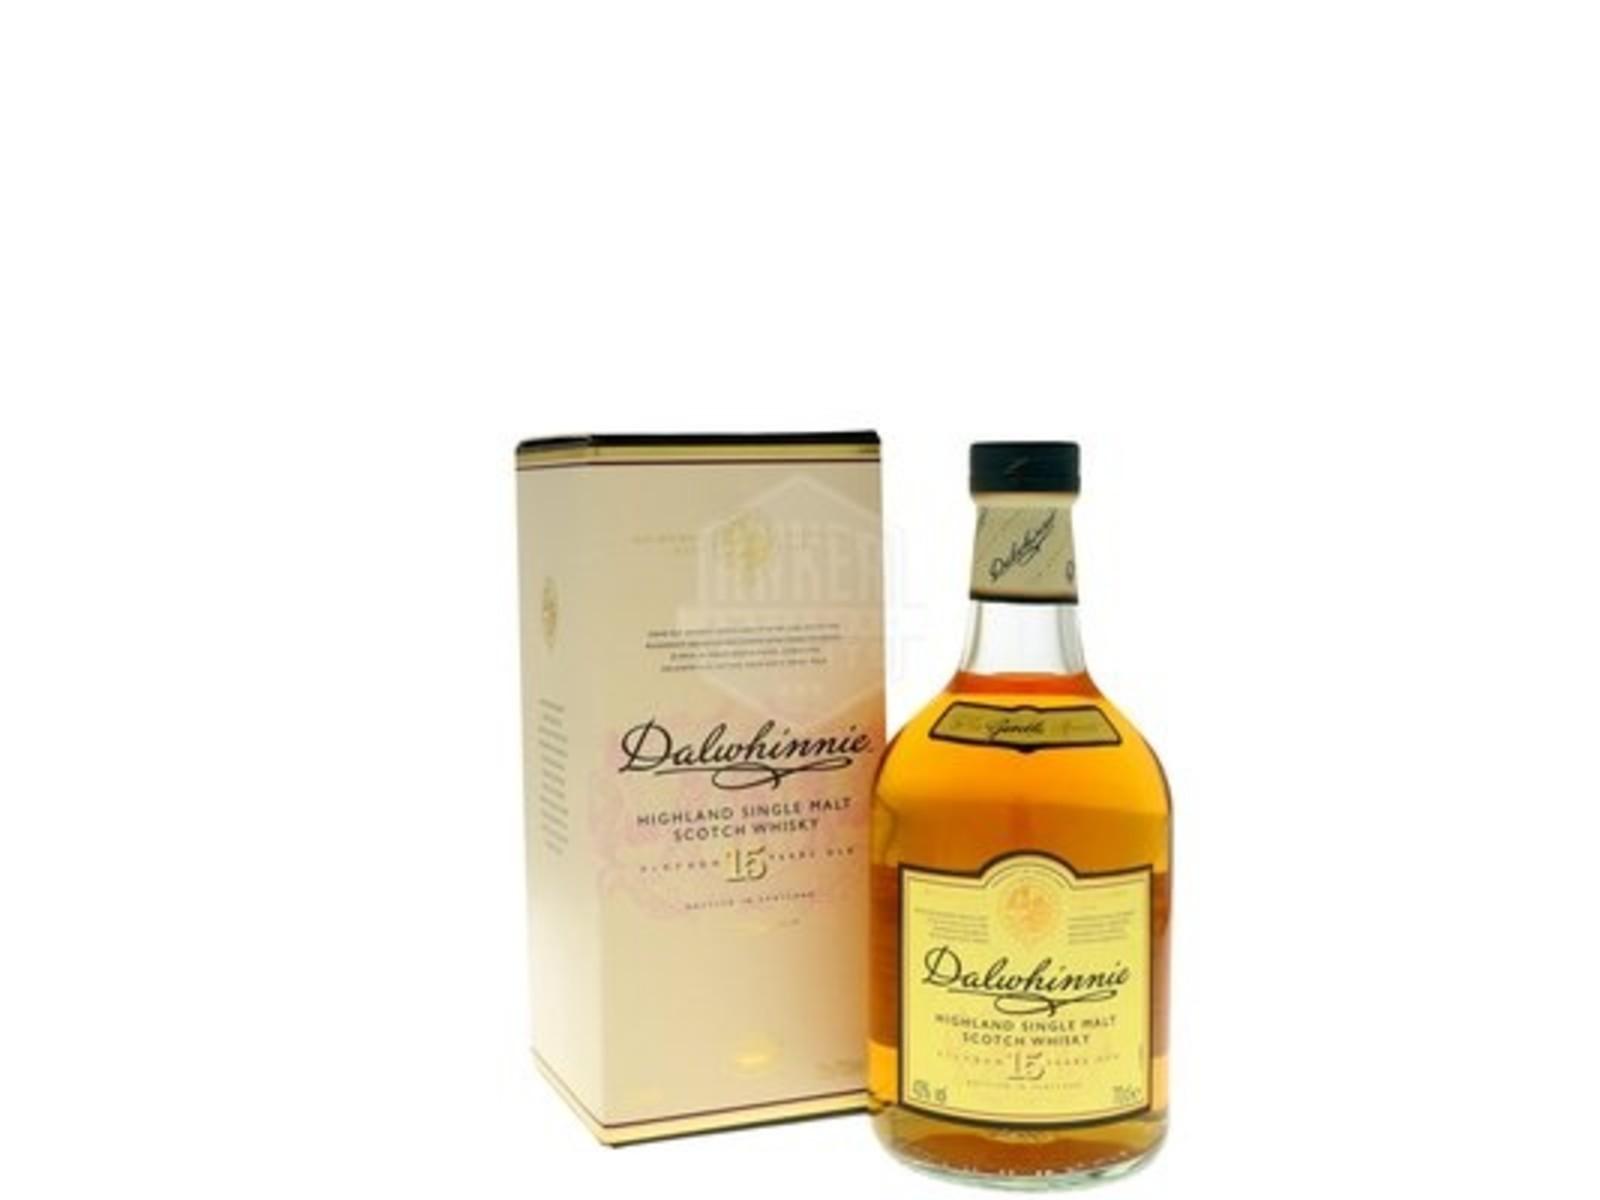 Dalwhinnie Dalwhinnie / 15 years / whisky / 0,7L